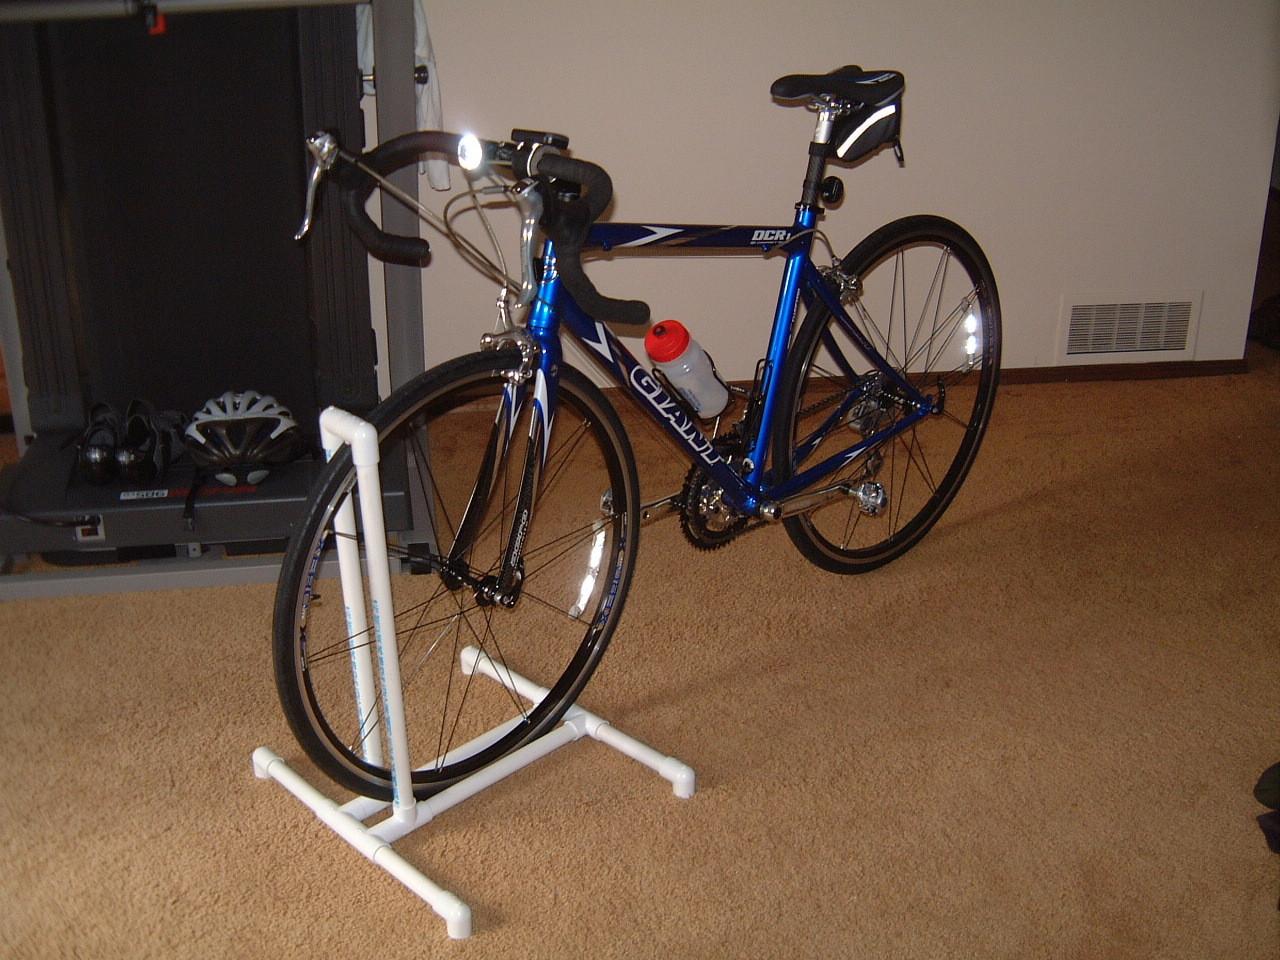 Best ideas about DIY Bike Racks . Save or Pin Bike Rack Now.